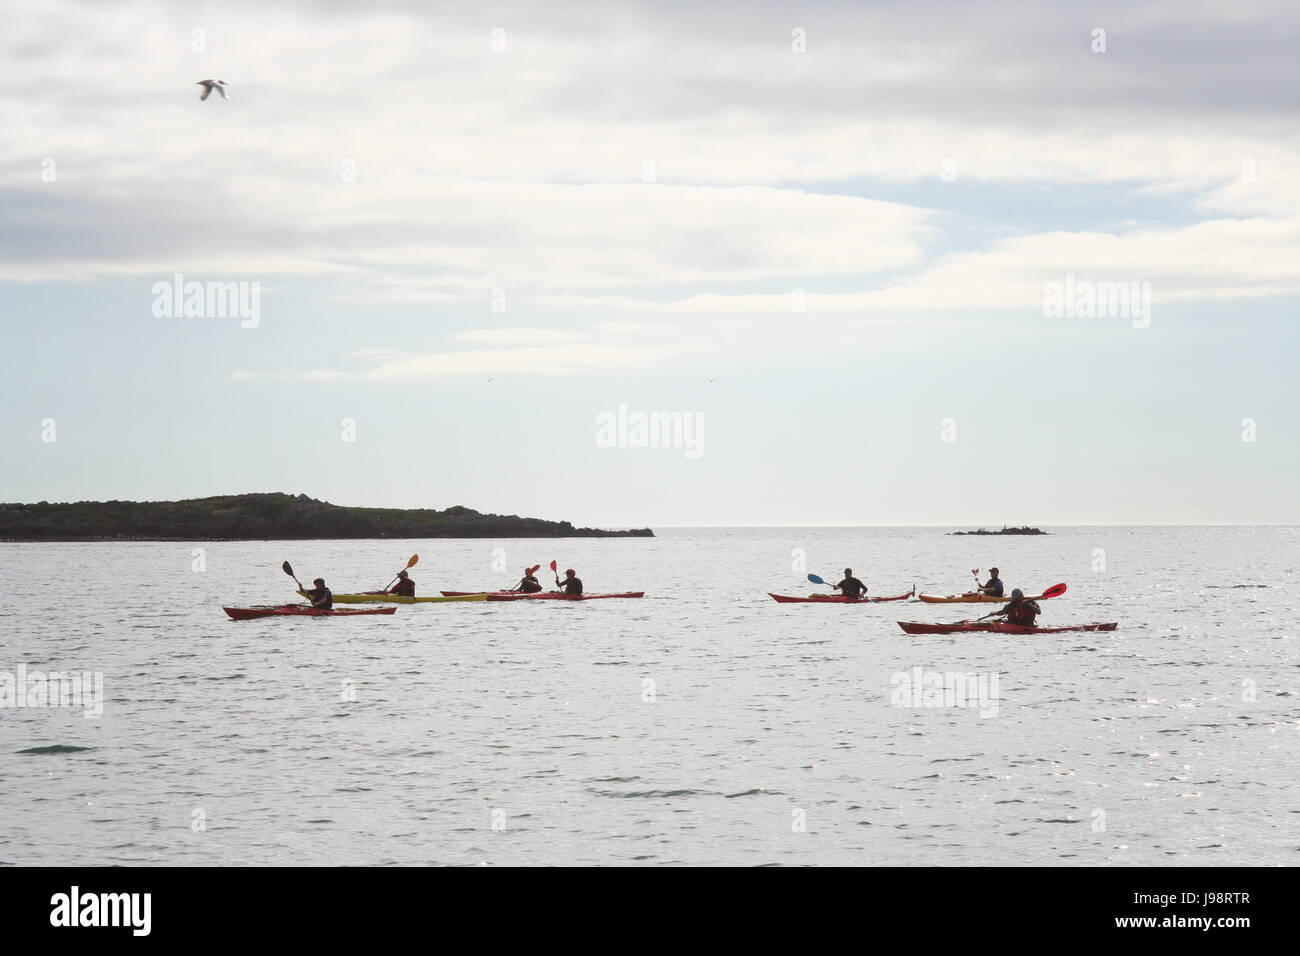 Group Kayaking , canoeing in Dublin Bay, Ireland - Stock Image